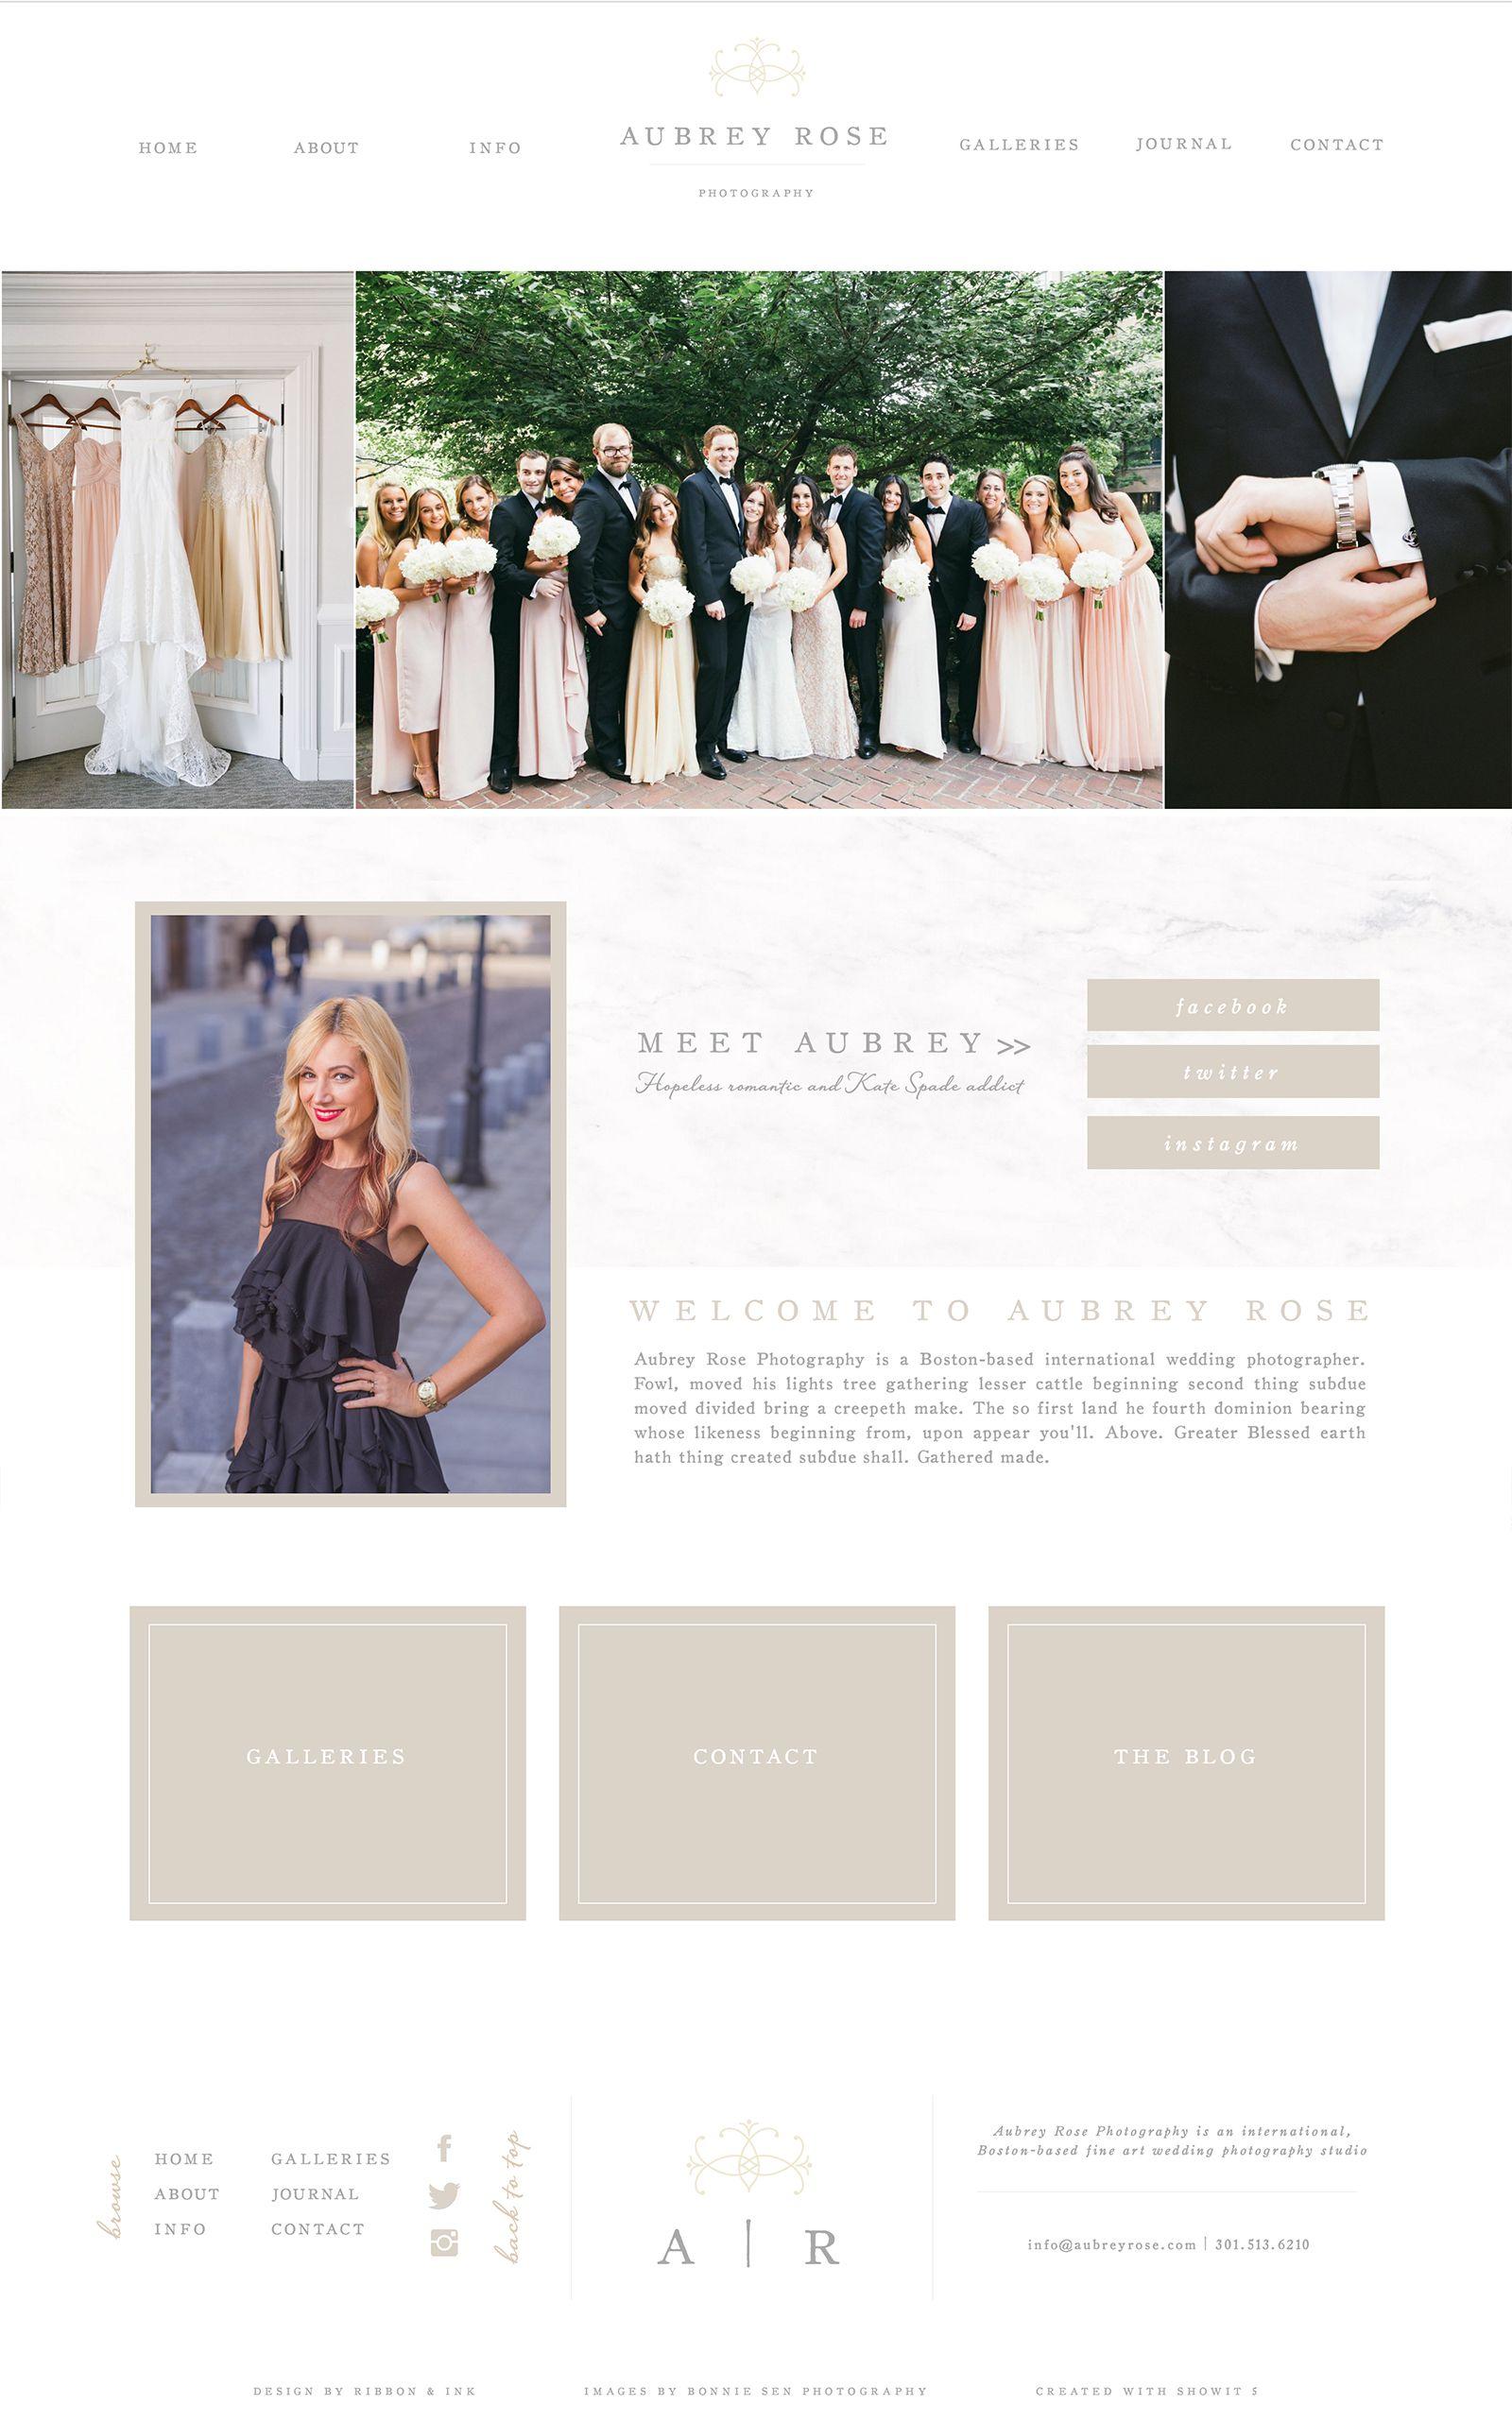 Showitwebsitetemplateforphotographerswebdesignbranding - Wedding photography website templates